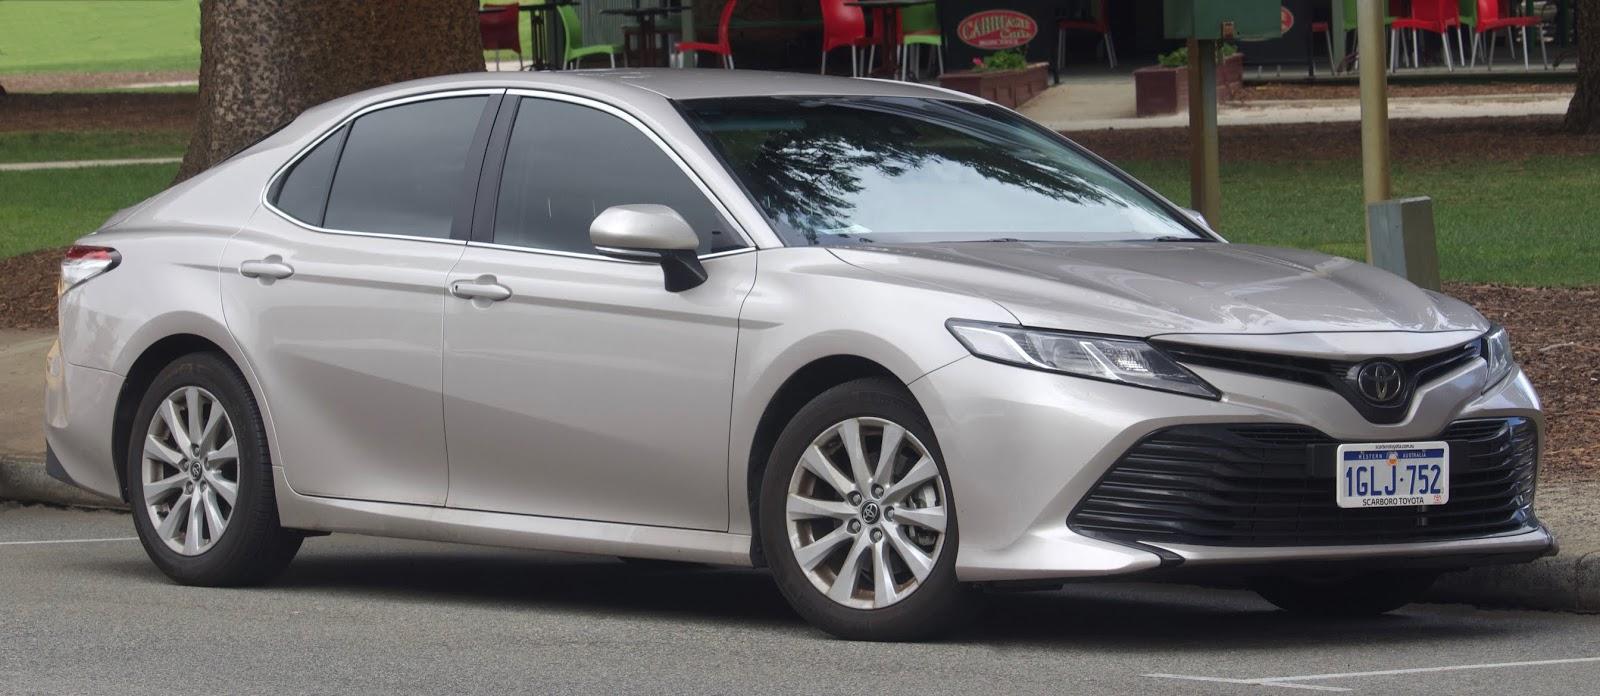 2019 Toyota Camry Sedan A